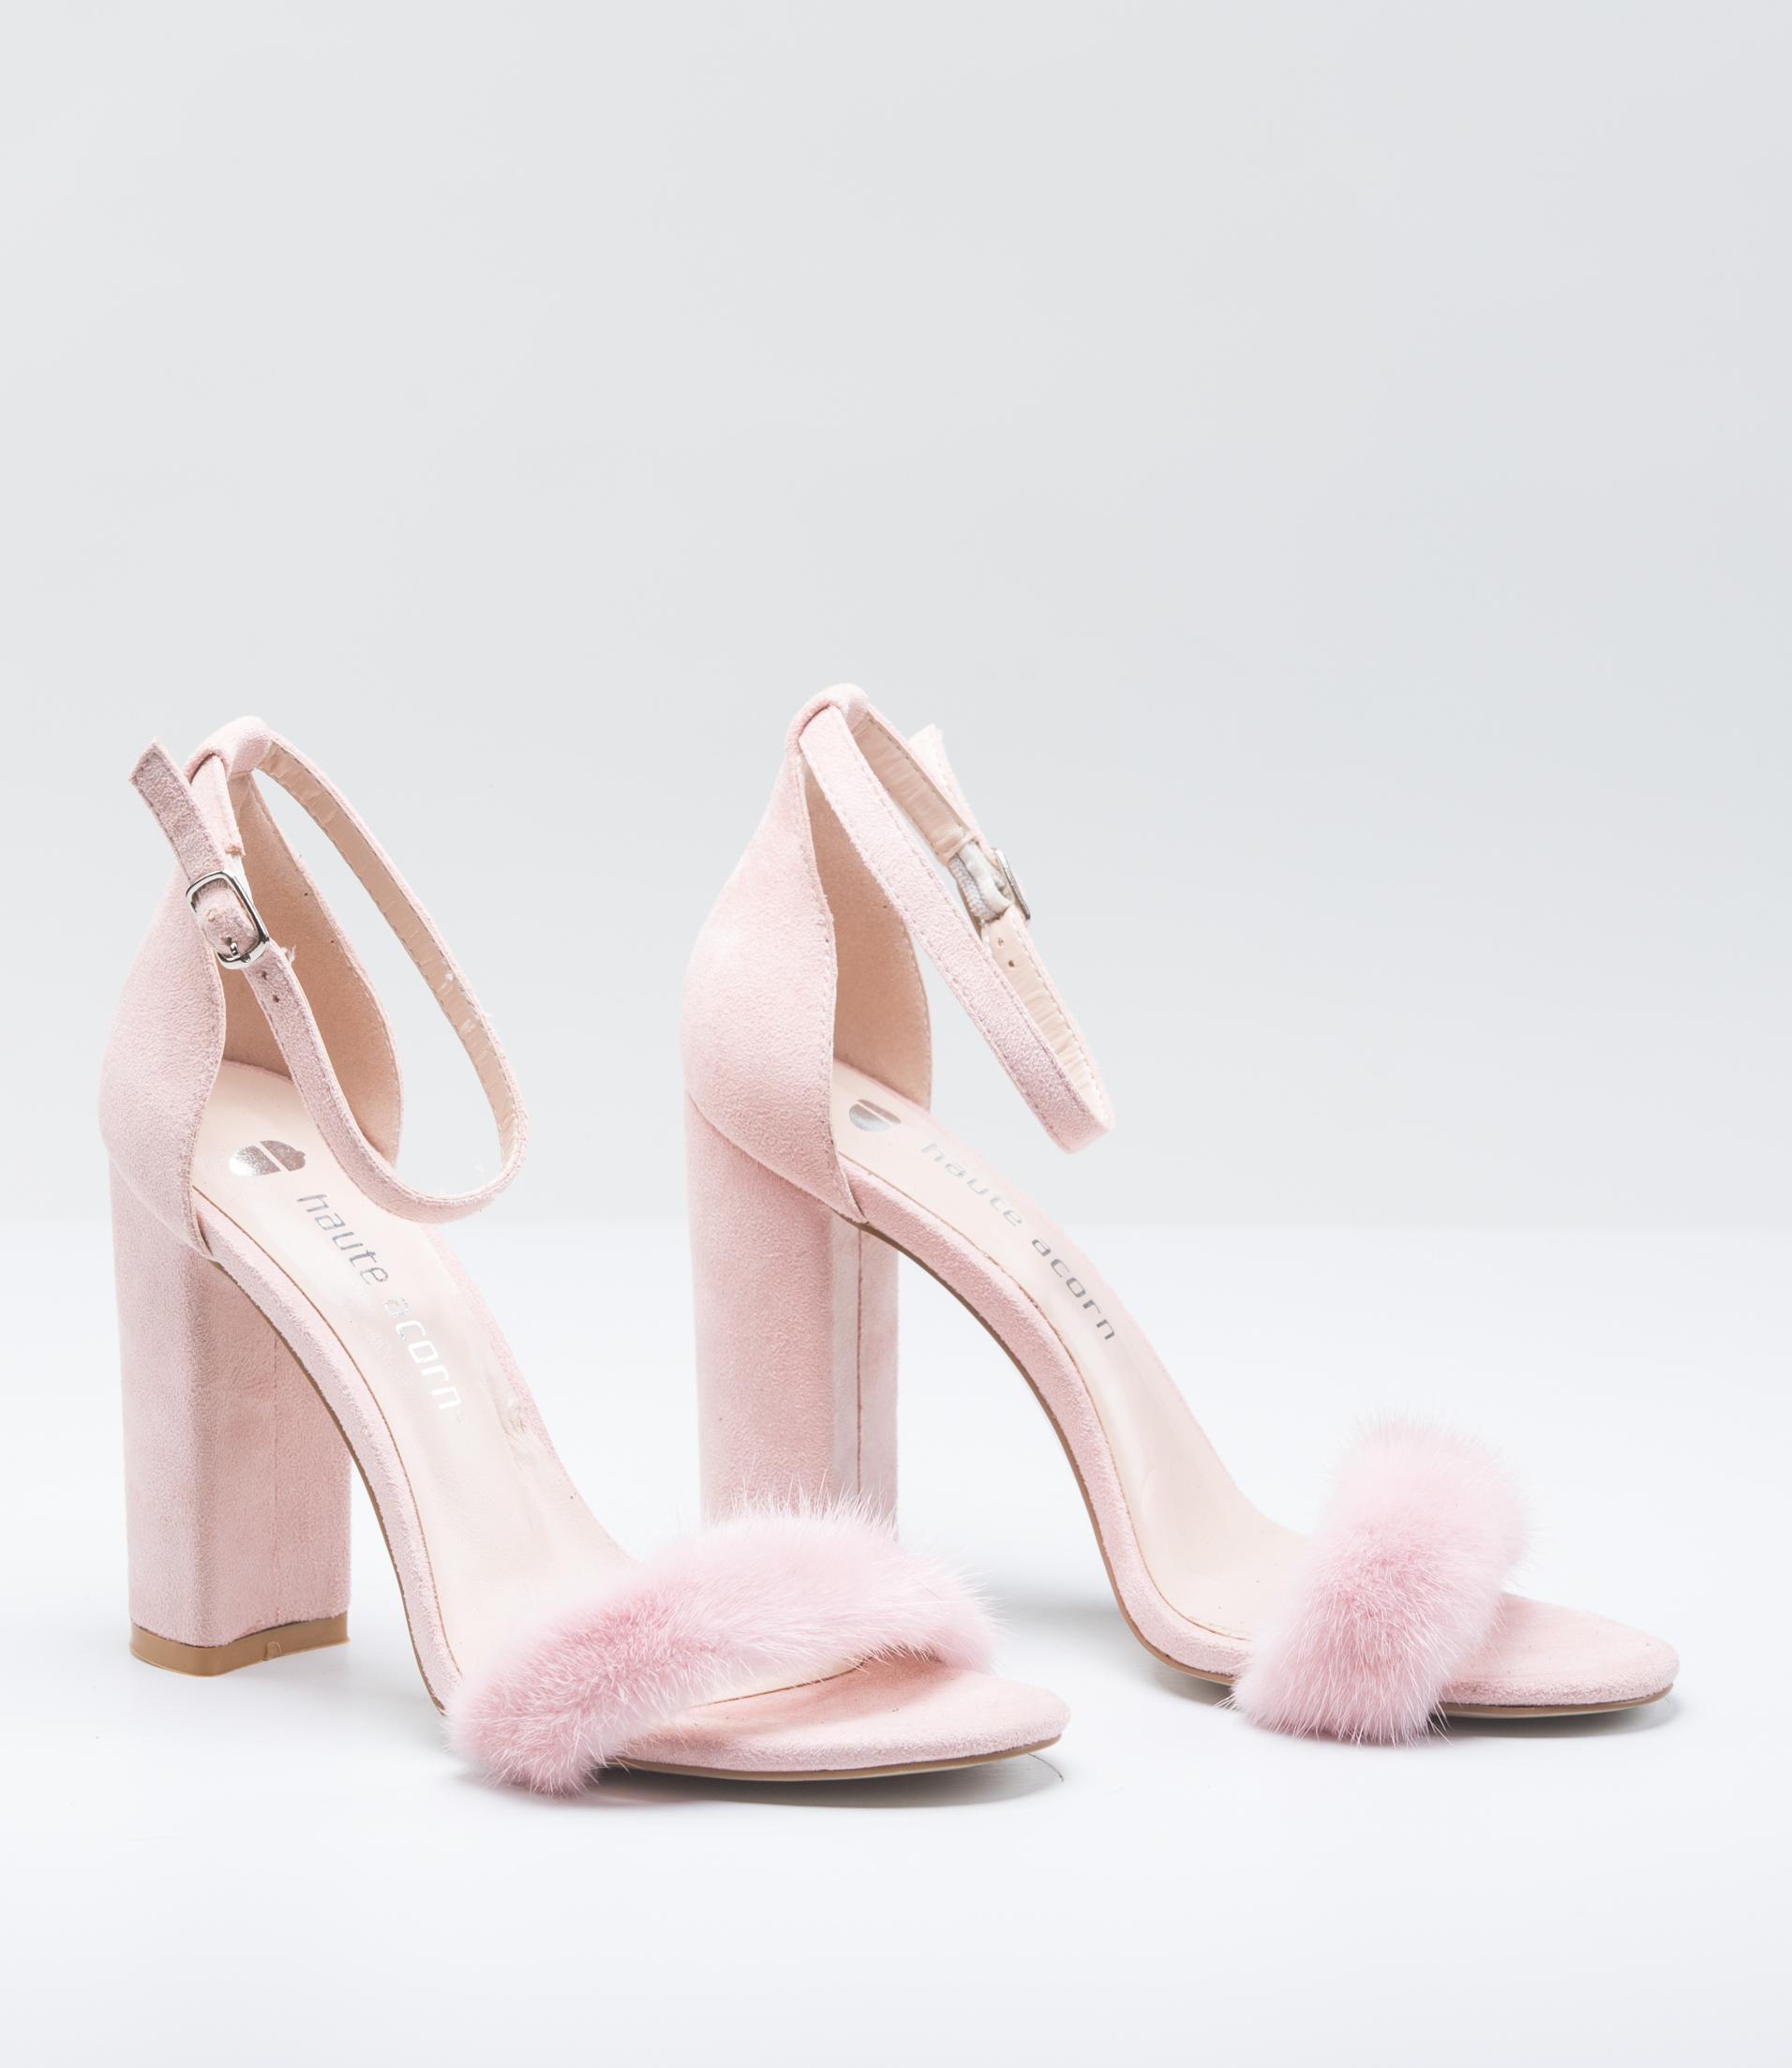 Pink Mink Fur Heels . Made of 100% Real